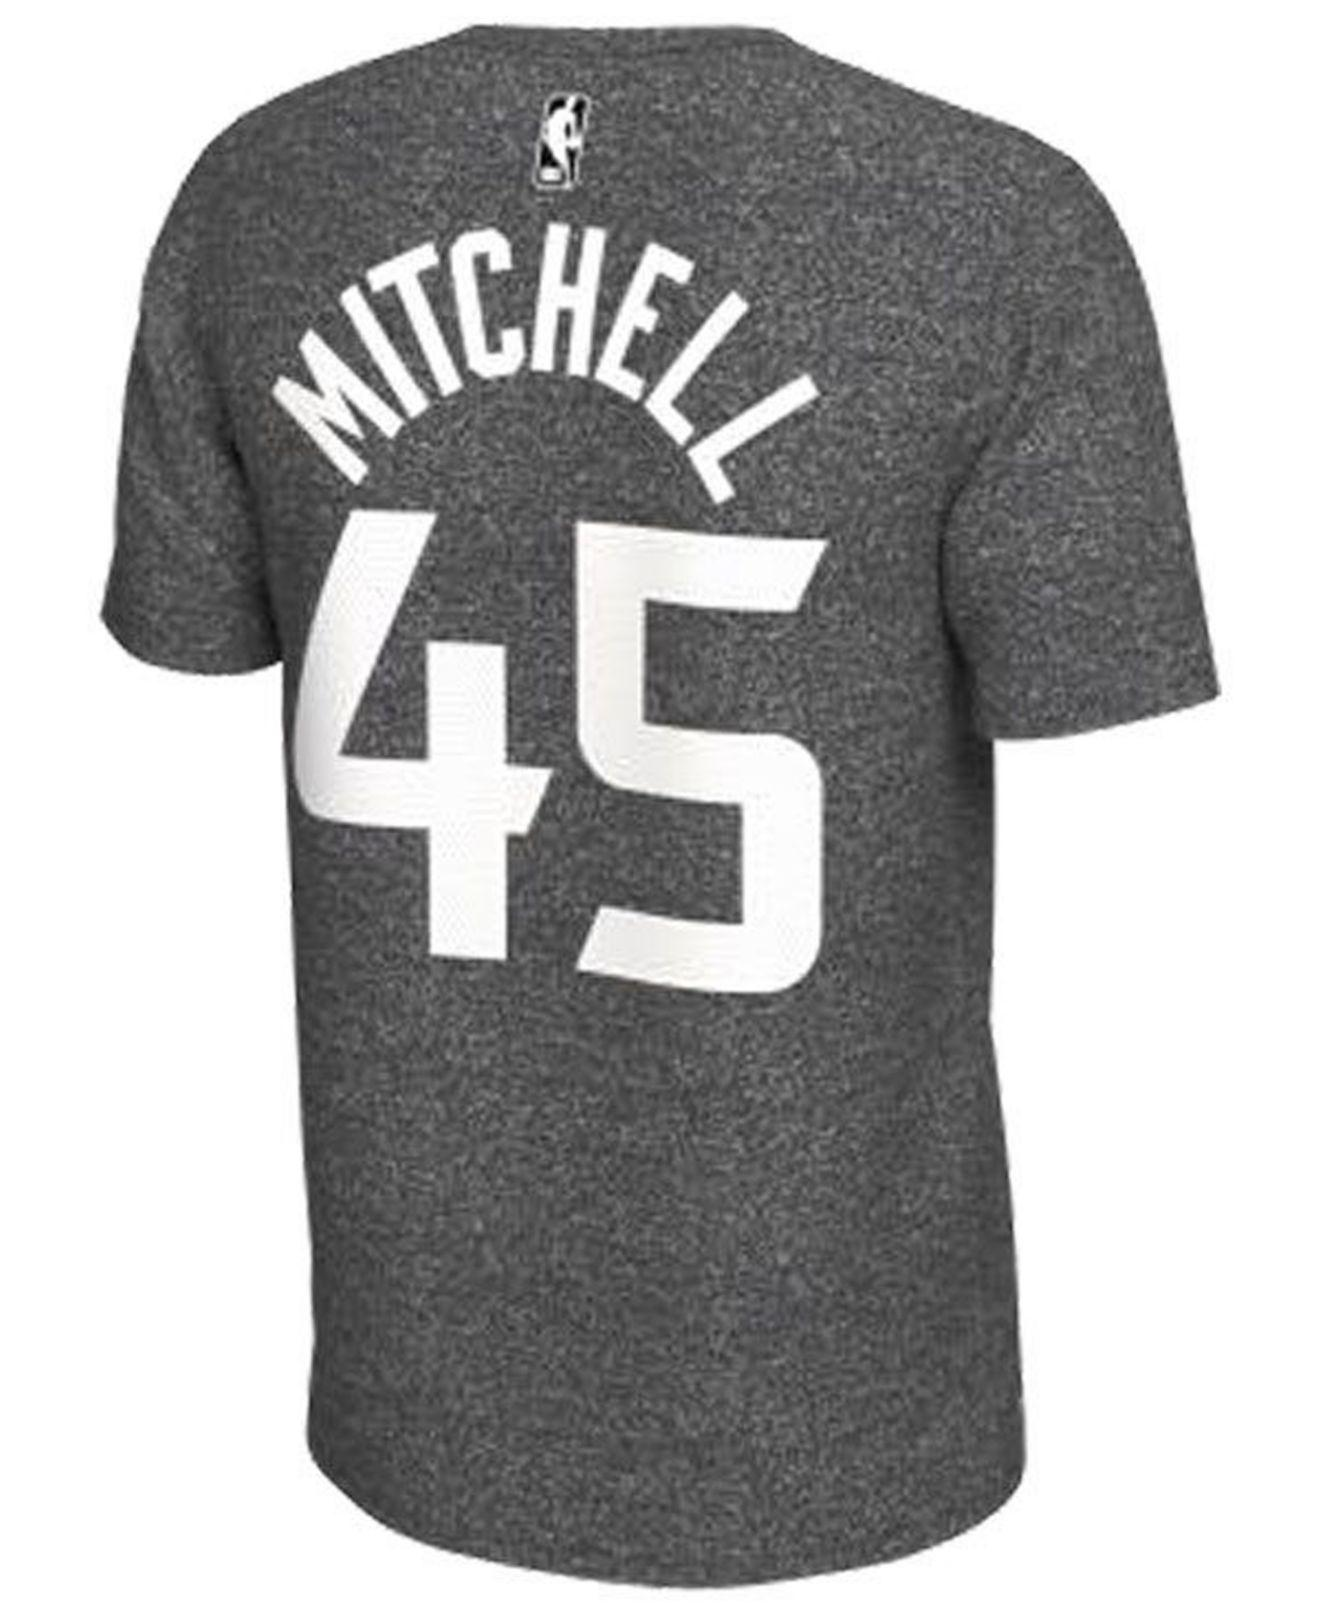 41c463b7782 Nike Donovan Mitchell Utah Jazz Marled Player T-shirt in Gray for Men - Lyst